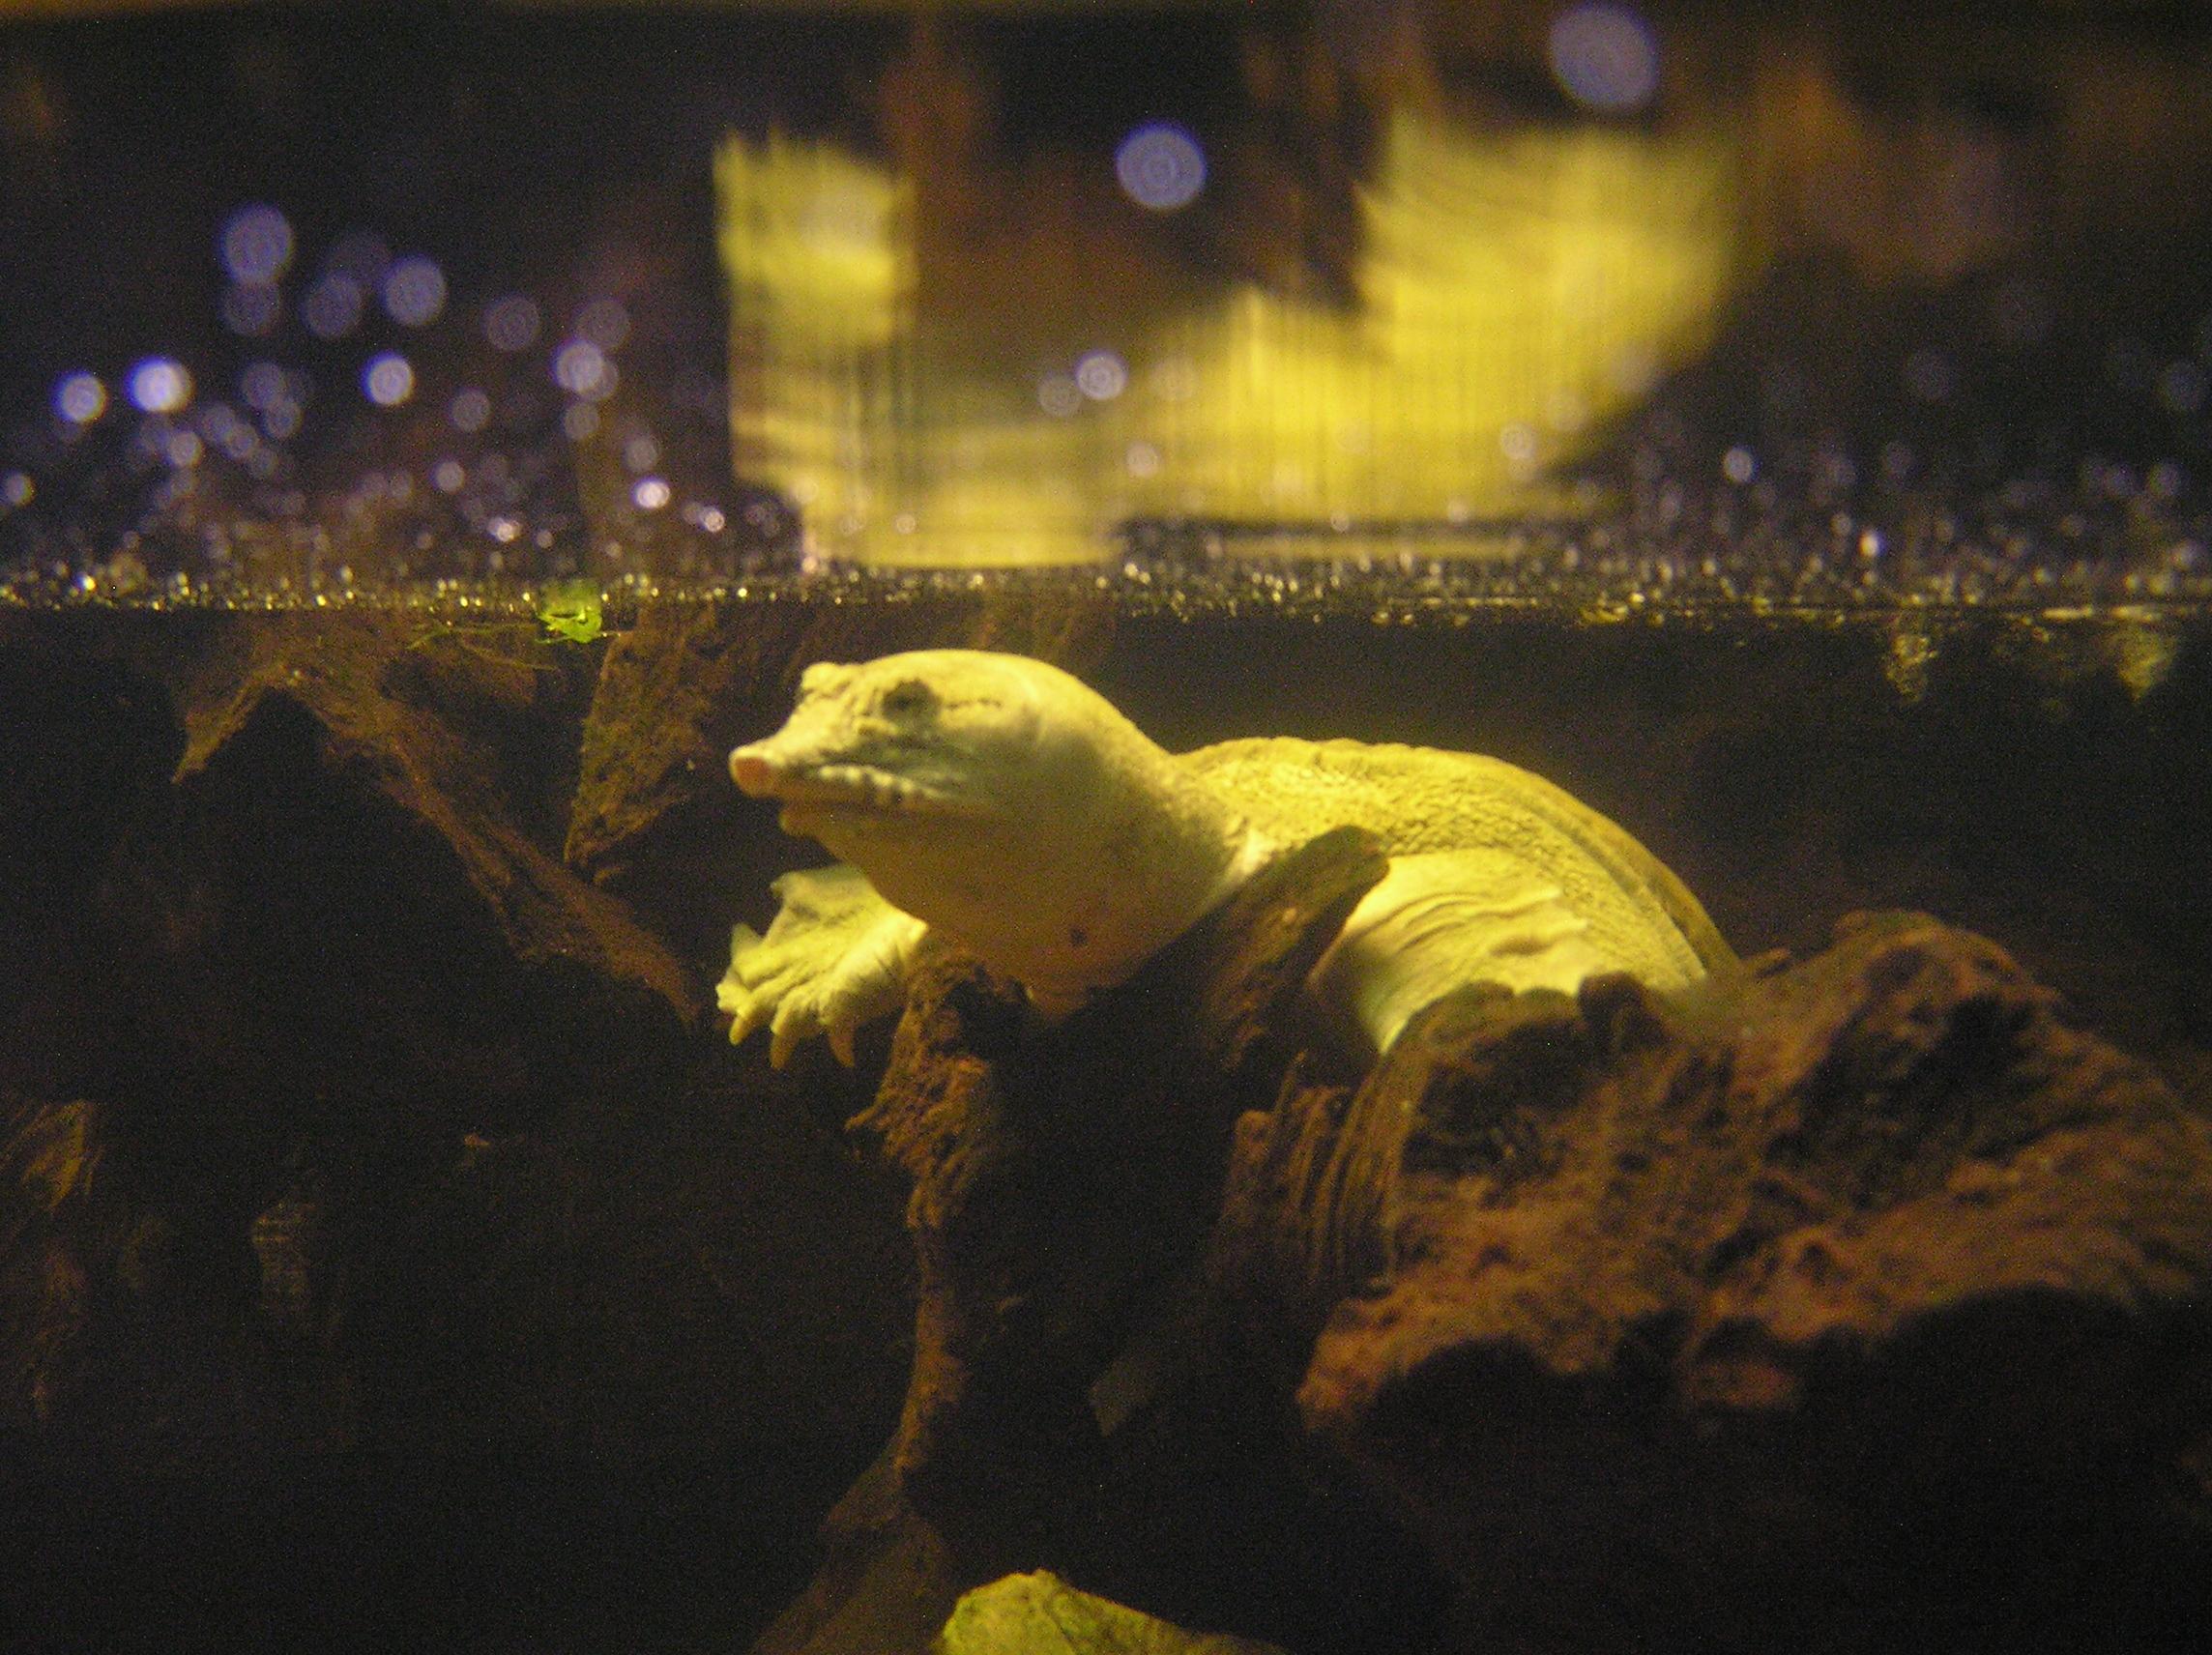 Image of Chinese softshell turtle